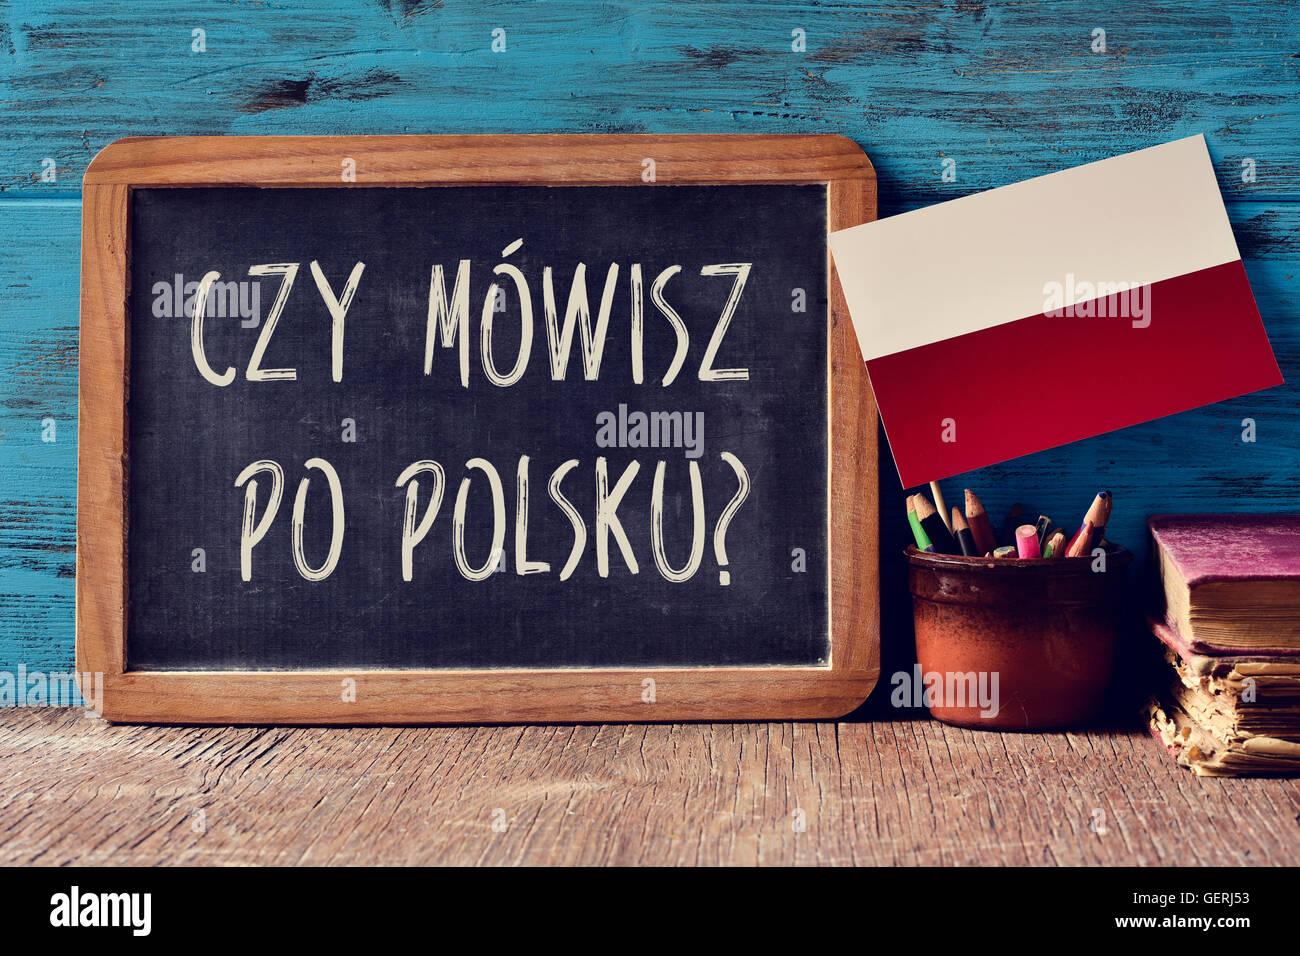 a chalkboard with the question czy mowisz po polsku?, do you speak Polish? written in Polish, a pot with pencils, - Stock Image